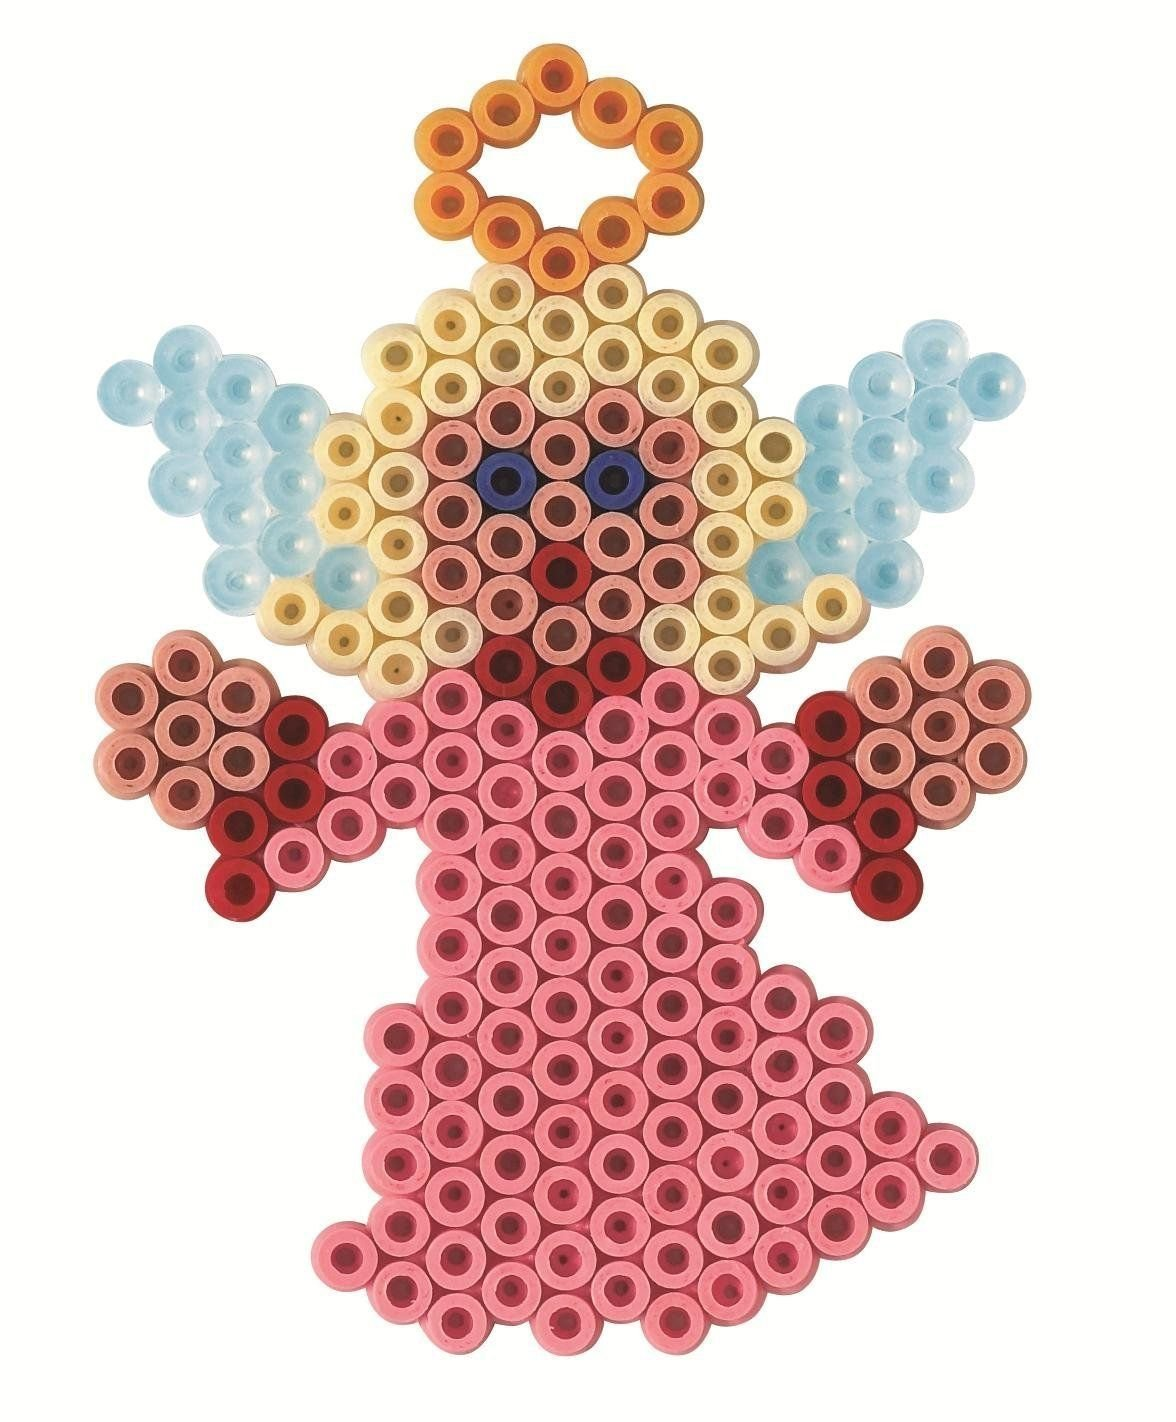 Hama 4097 Bügelperlen Perlenset Engel Ca 1100 Perlen 1